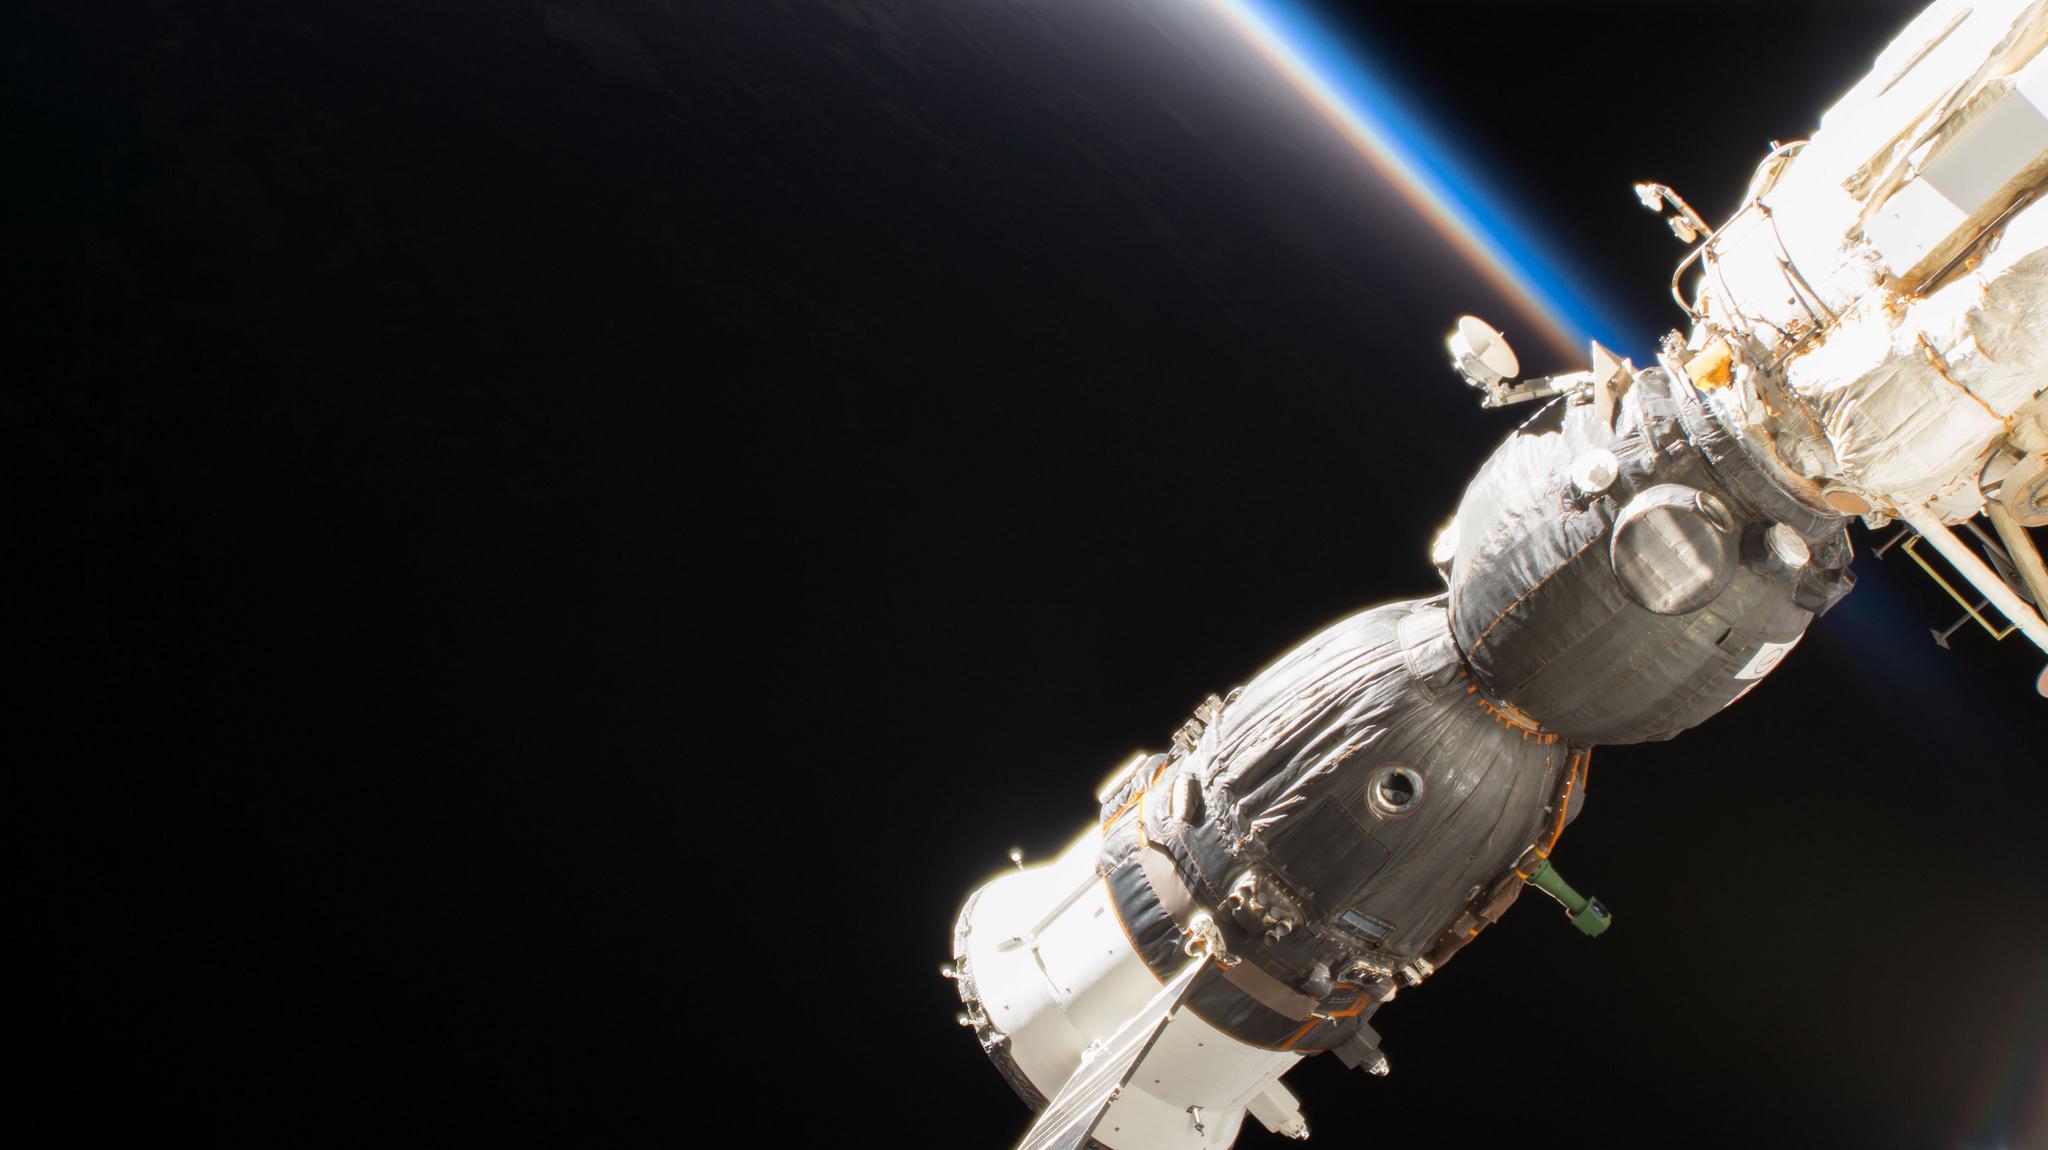 Soyuz MS-09 docked to the Russian Rassvet module. Credit: NASA